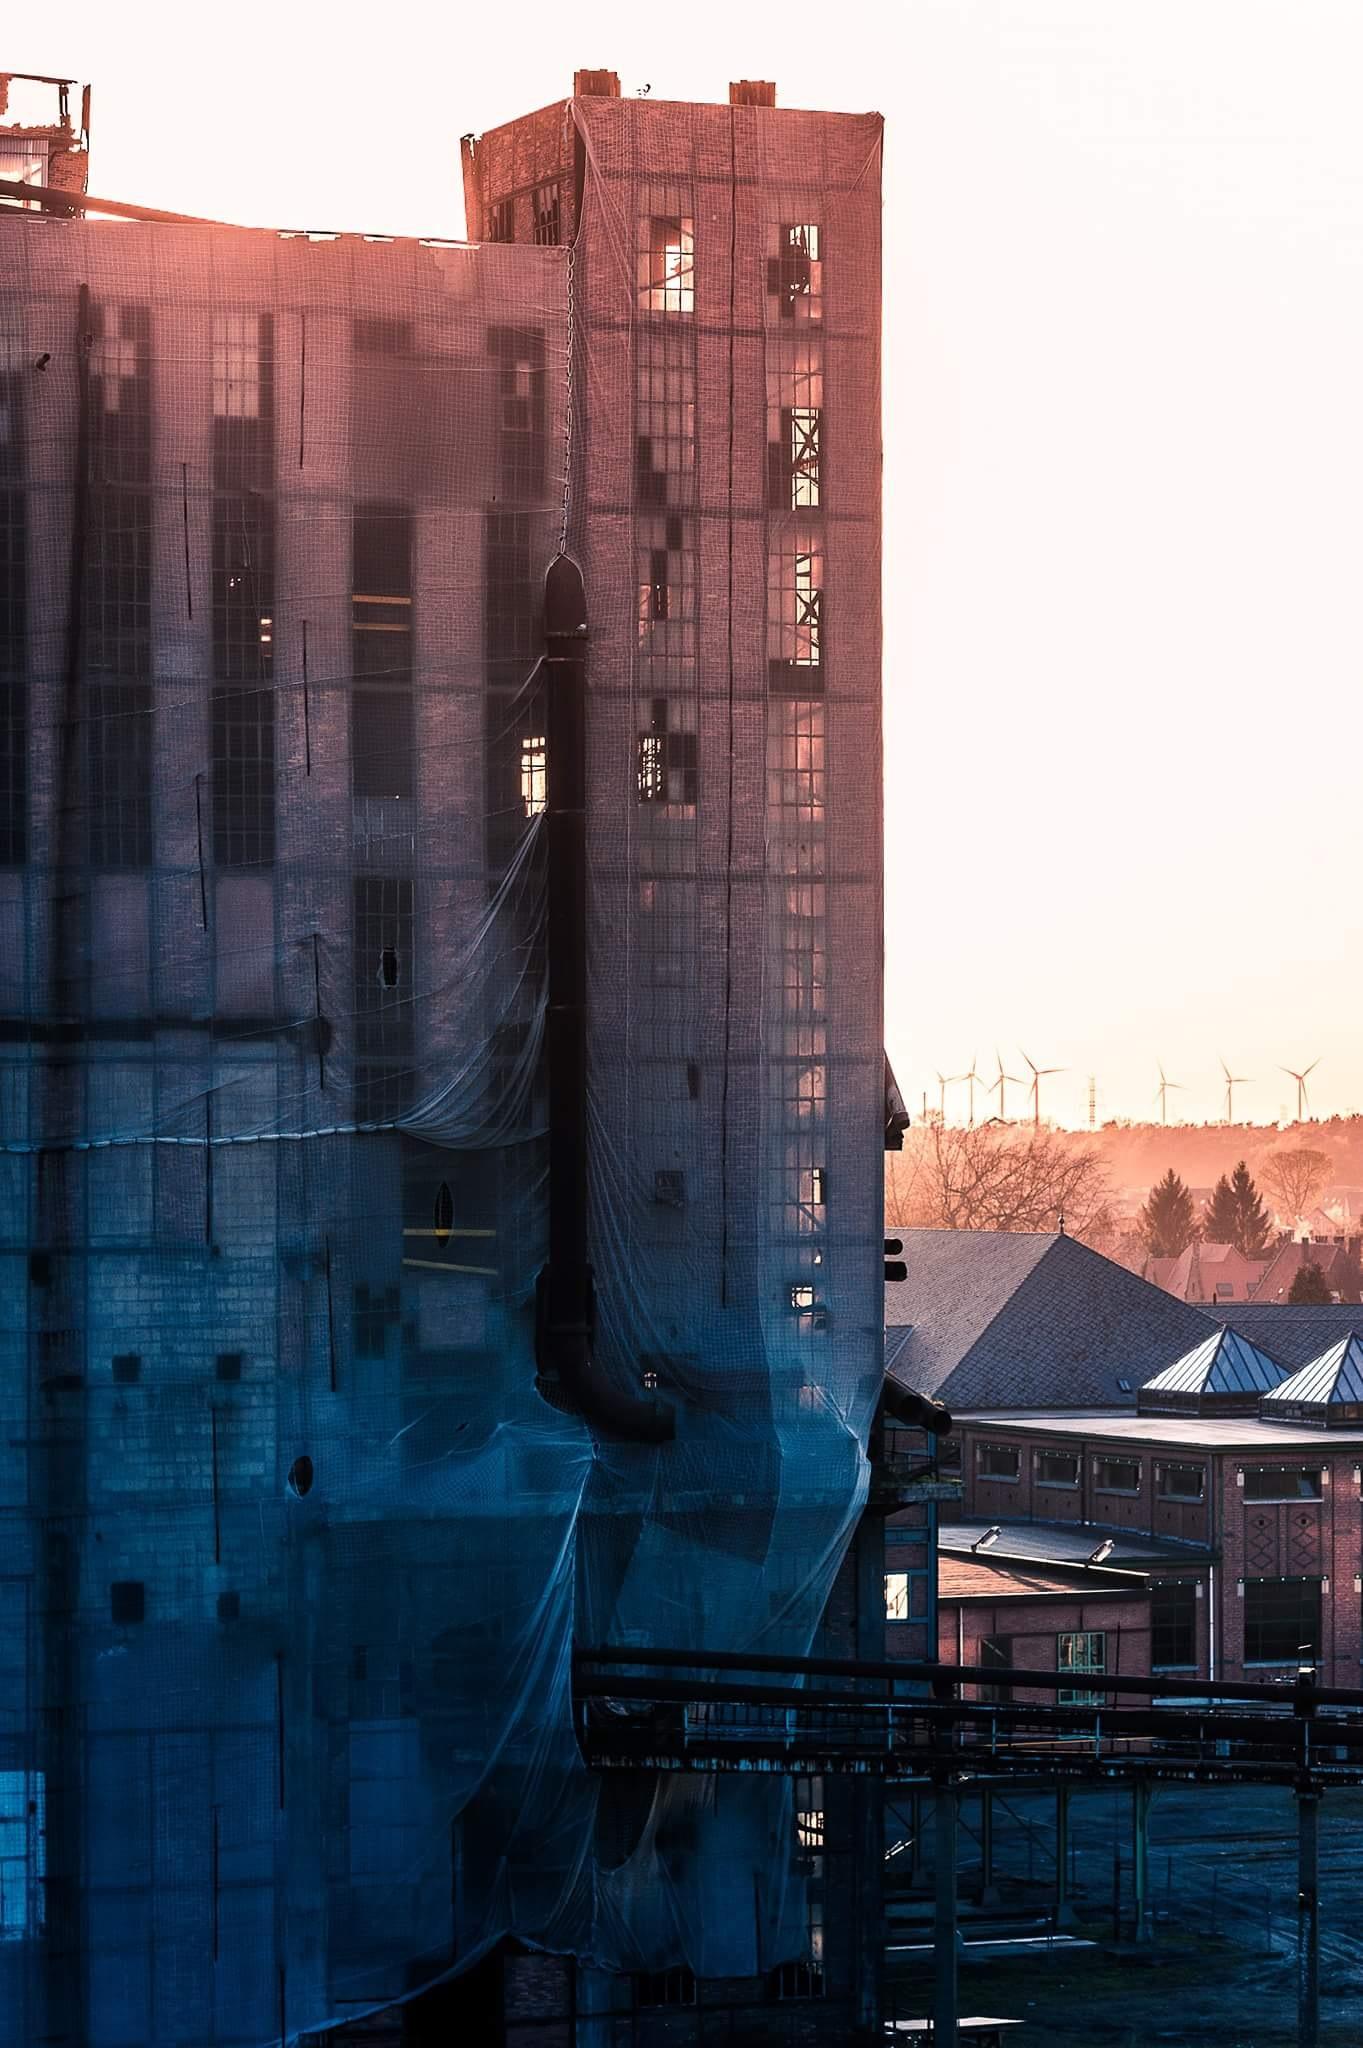 Beringen coal mine series  by Steve Guessoum